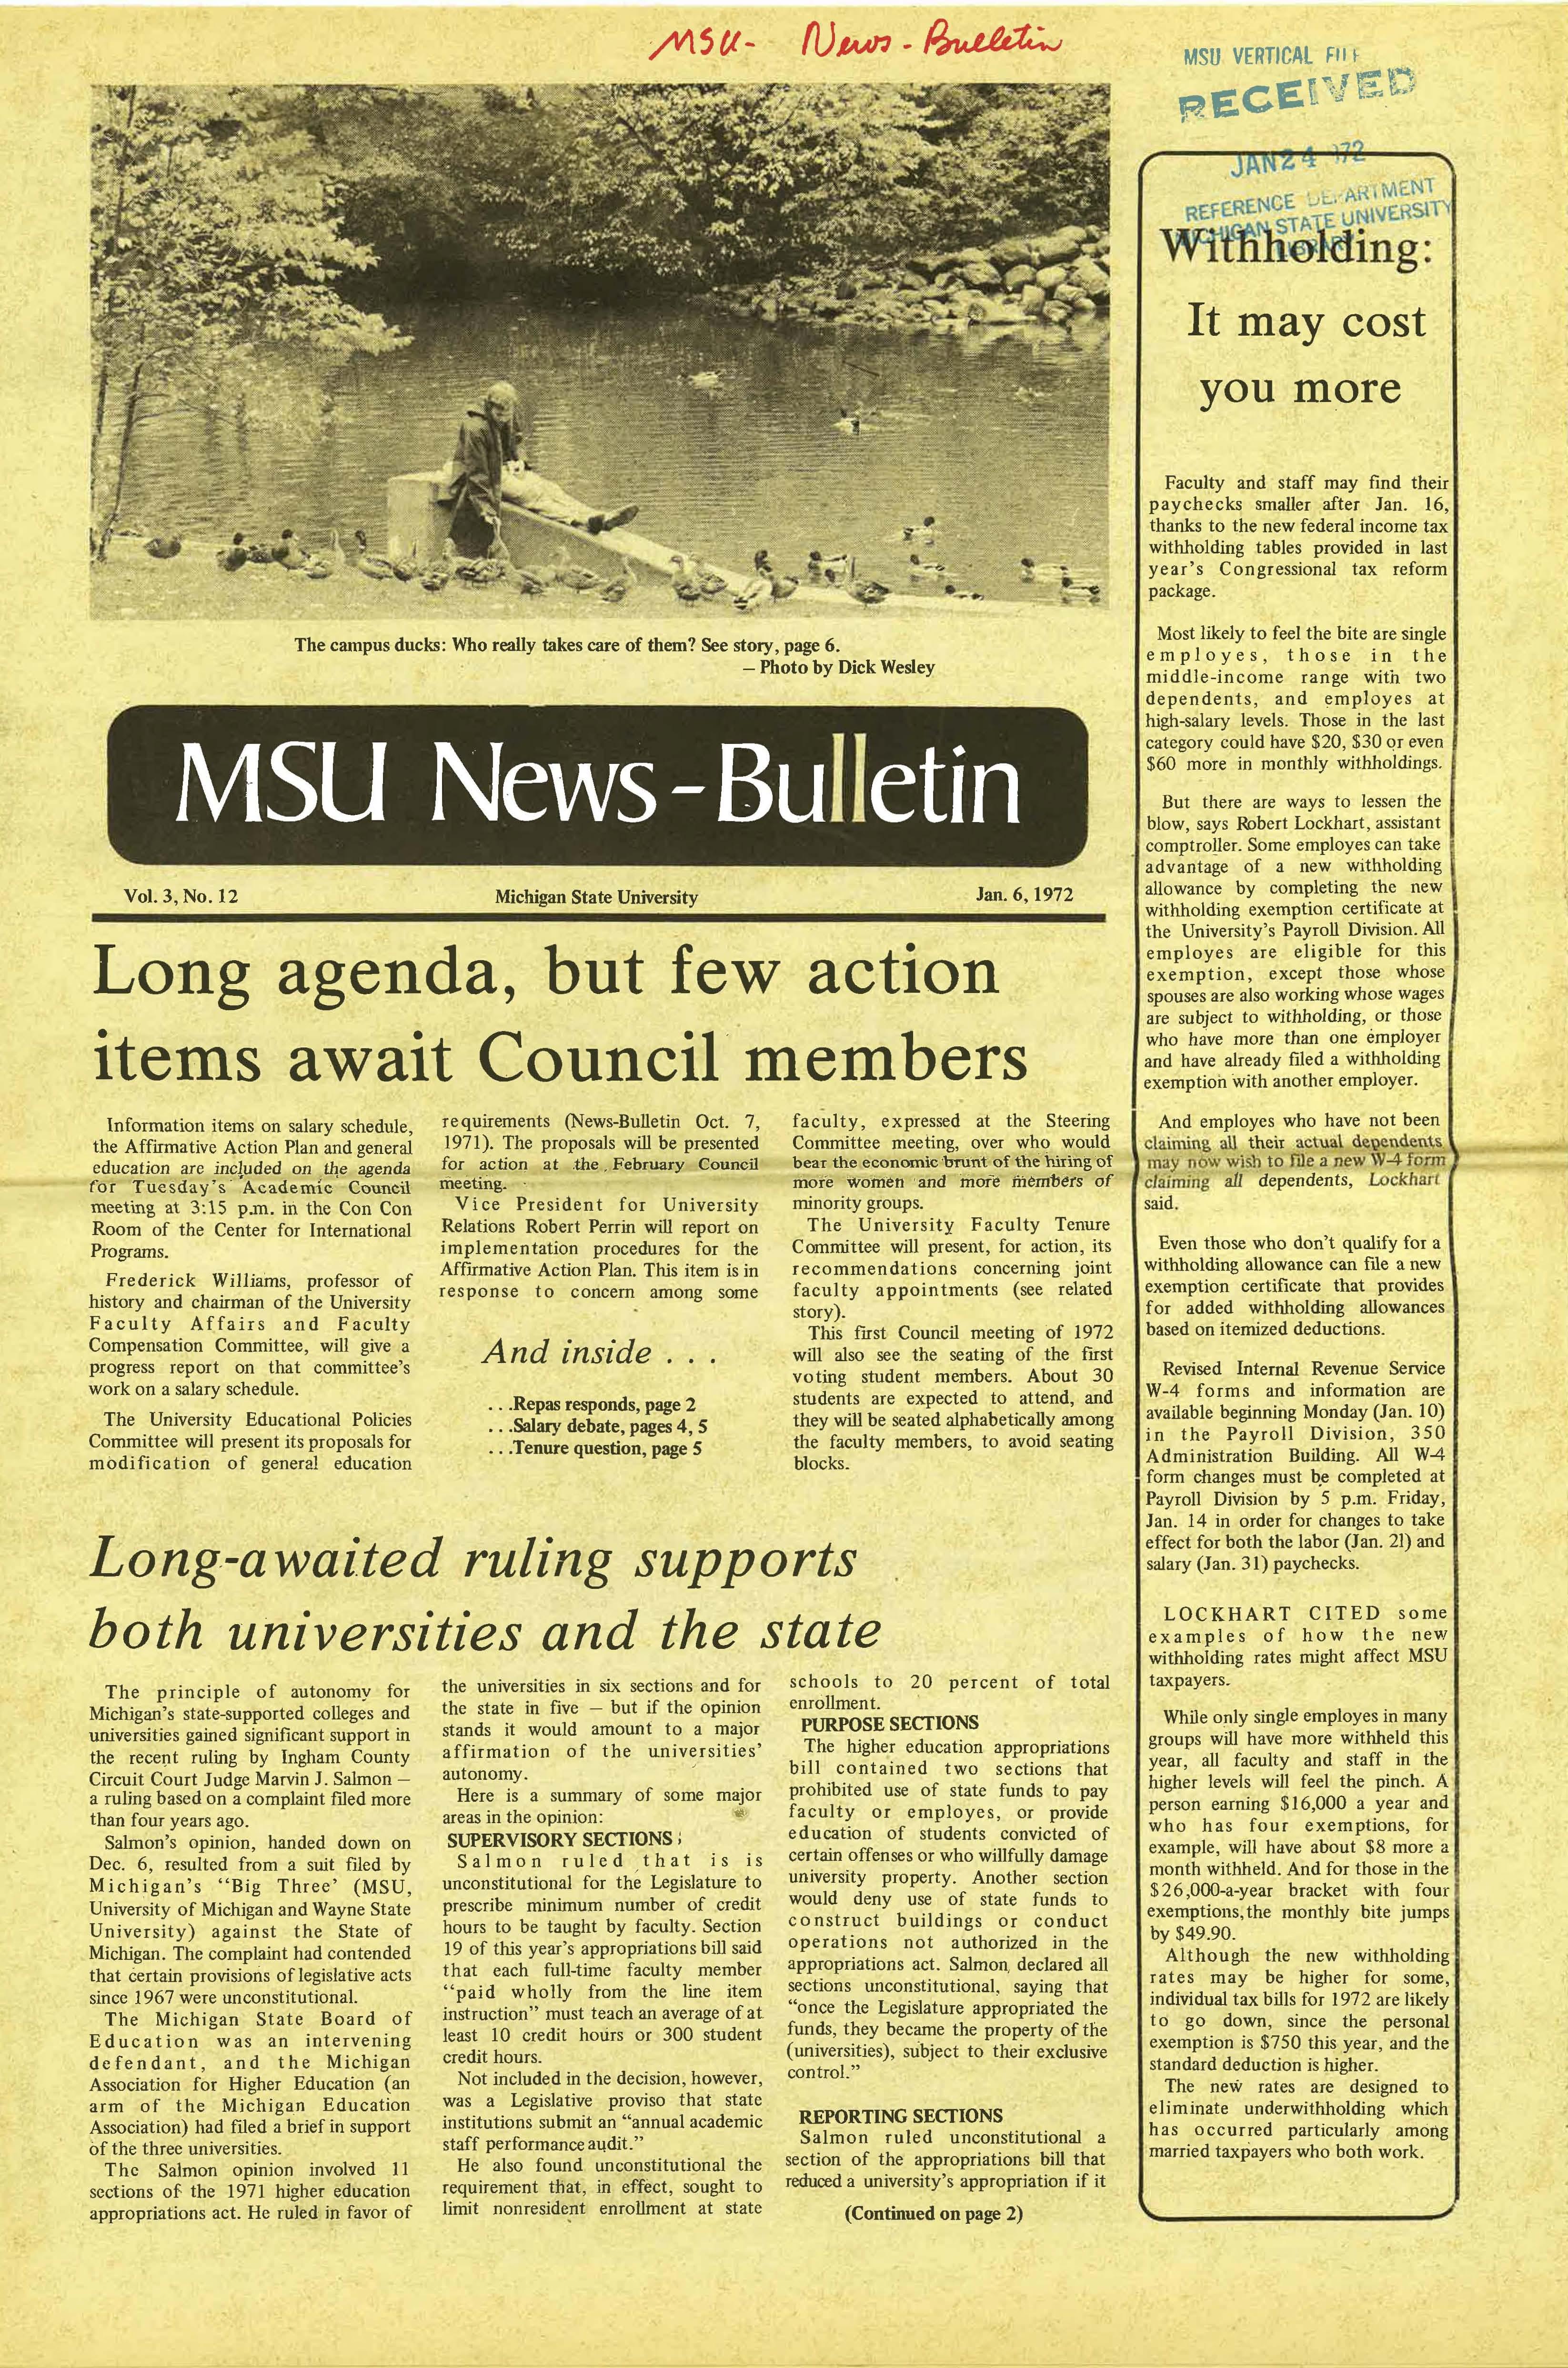 MSU News Bulletin, vol. 3, No. 15, January 27, 1972